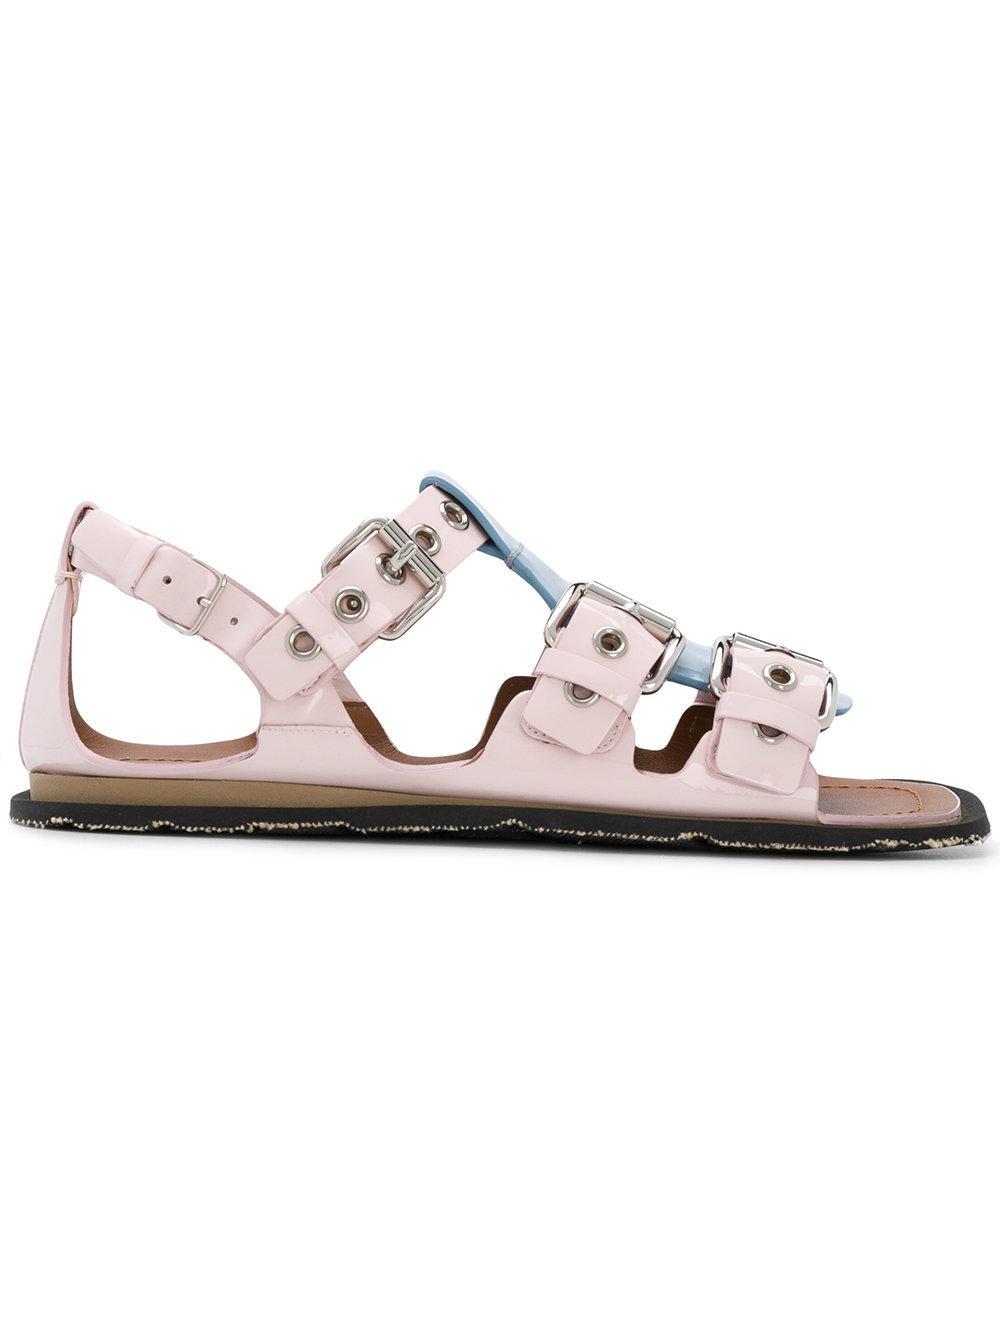 0286debe413f70 Miu Miu Pink Colorblocked Buckle Sandals